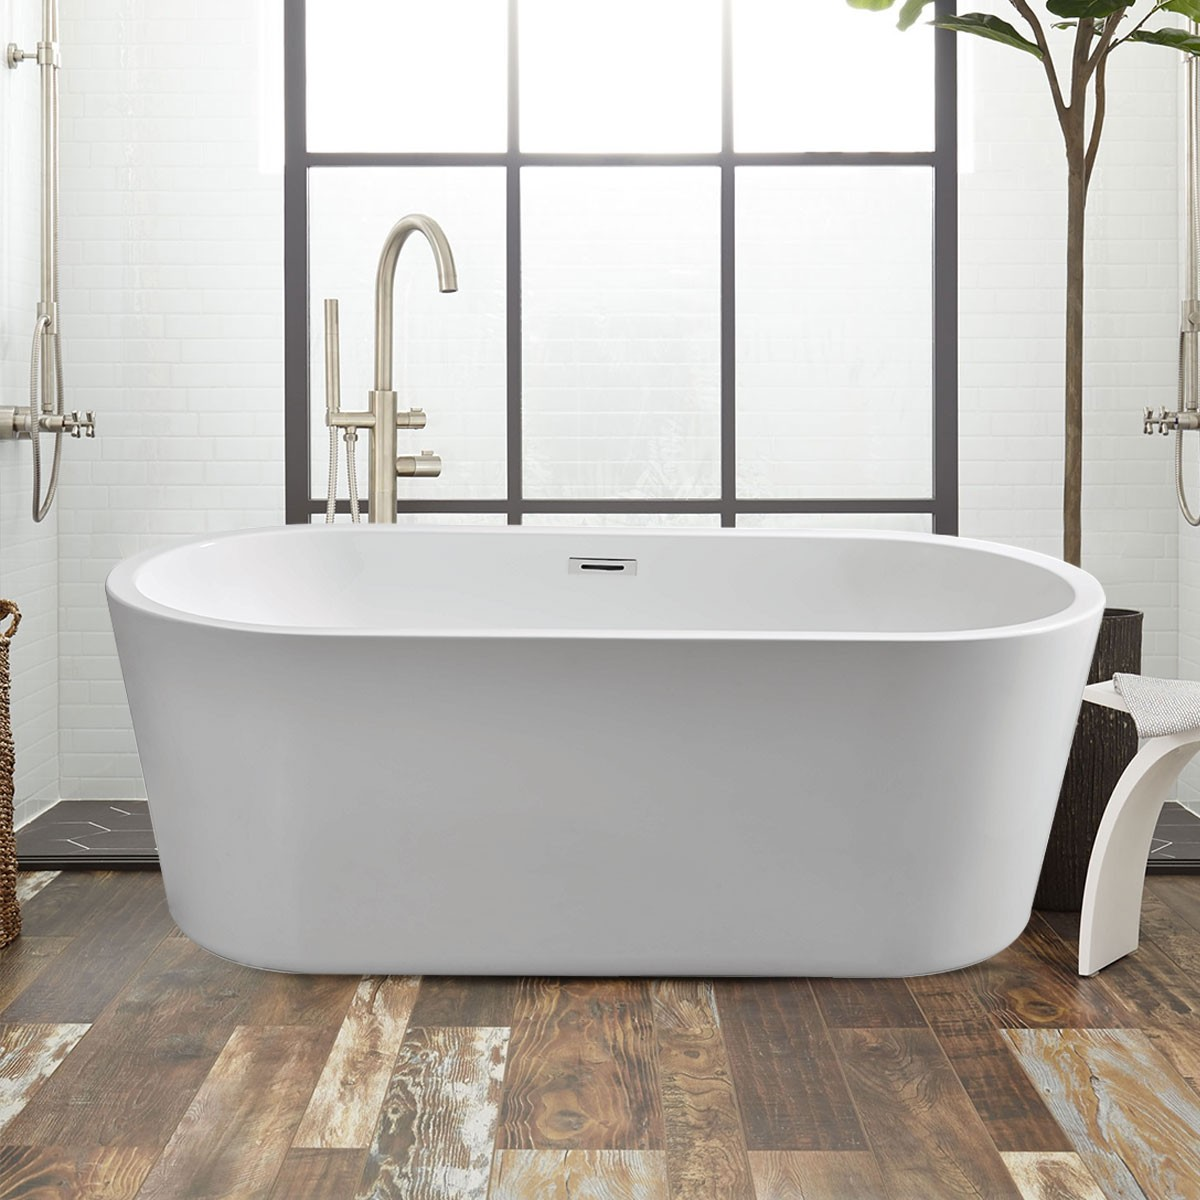 59 In Soaking Bathtub – Acrylic Pure White (DK-PW-99011)